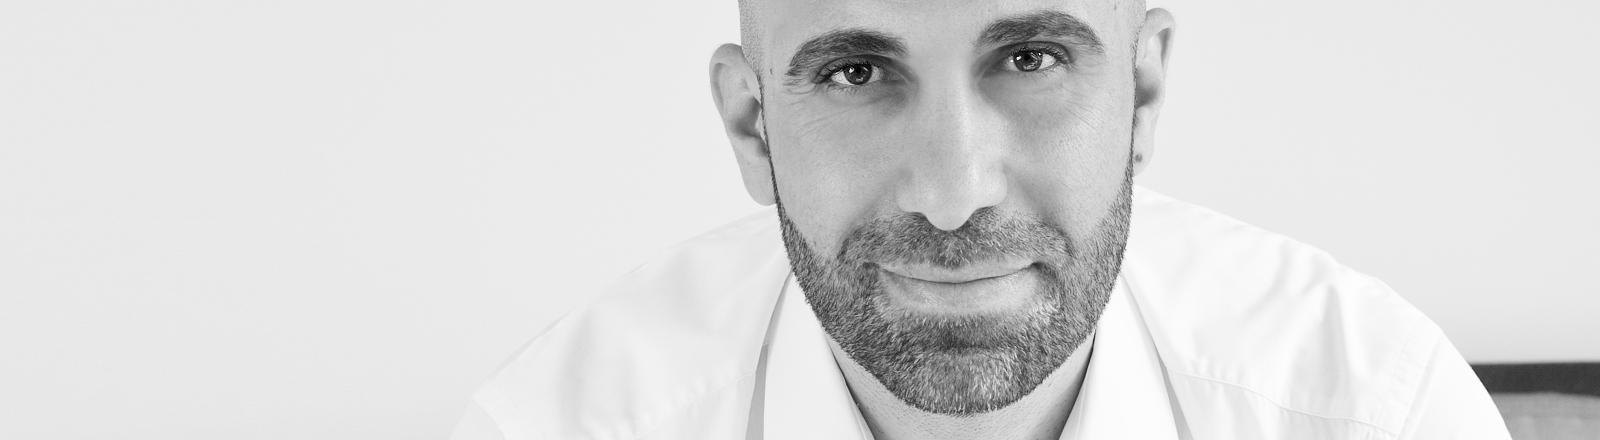 Ahmad Masour war radikal, nun arbeitet er als Psychologe.